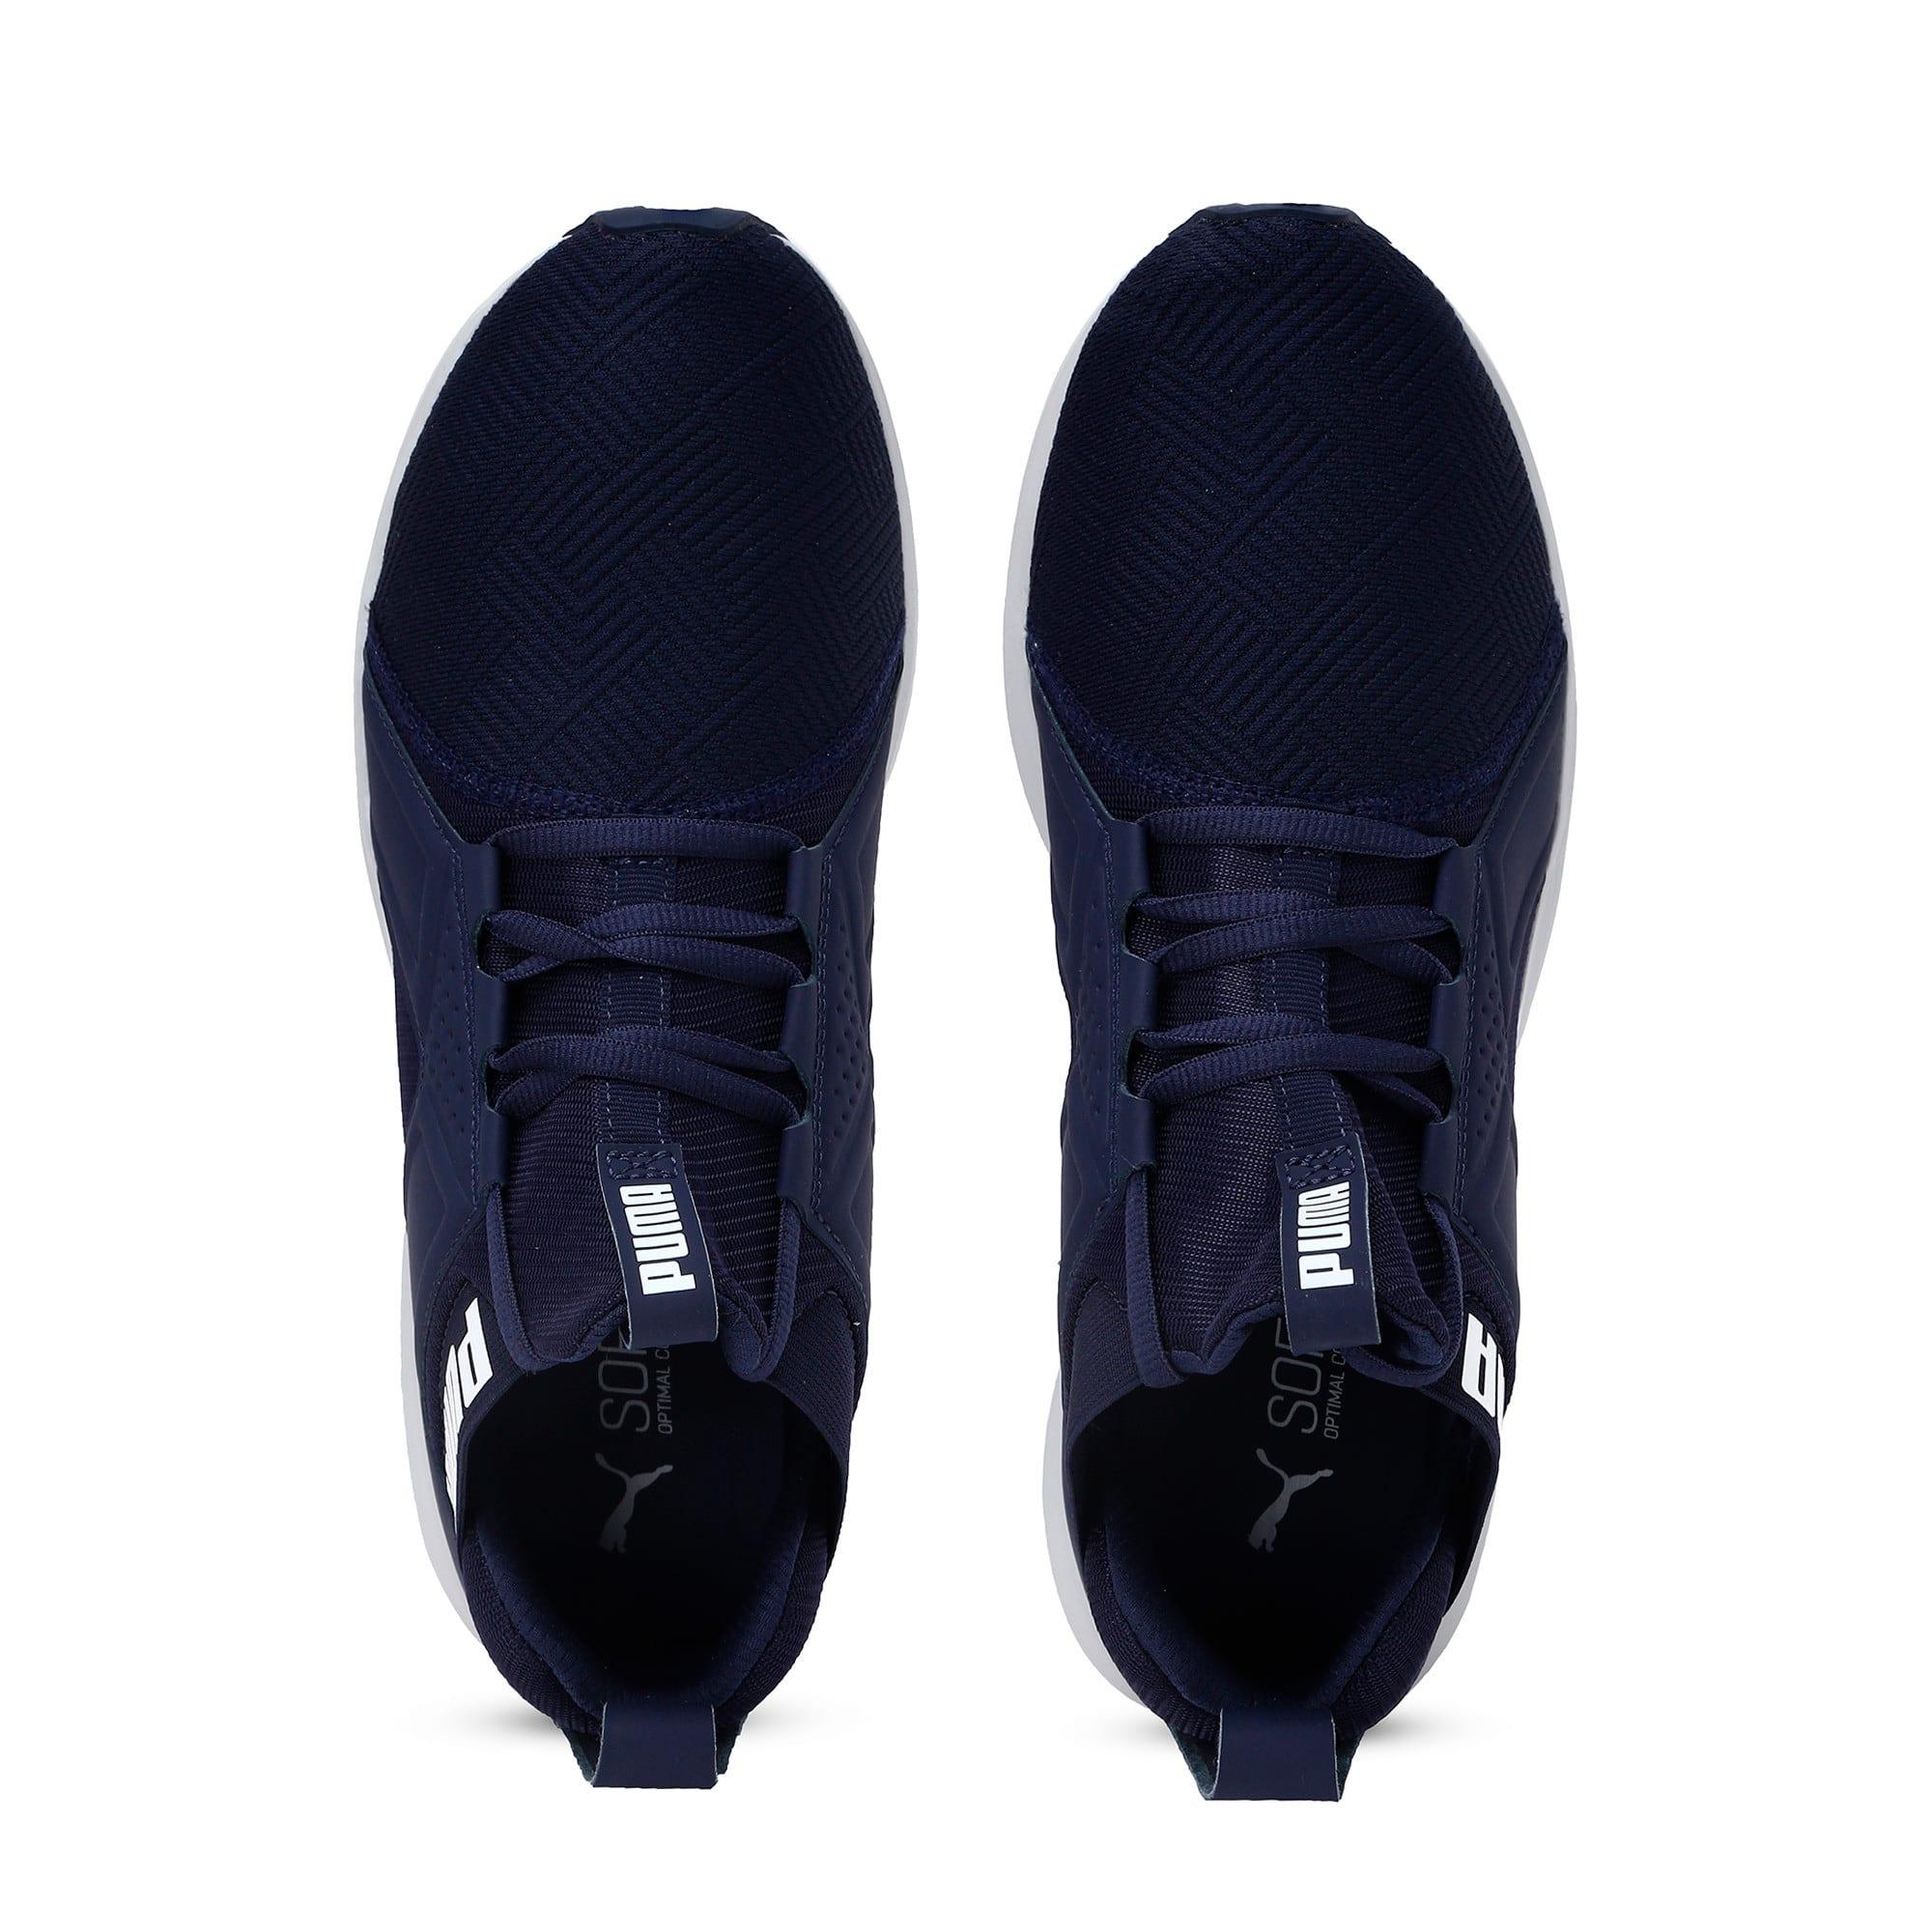 Thumbnail 6 of Enzo Geo Men's Running Shoes, Peacoat, medium-IND